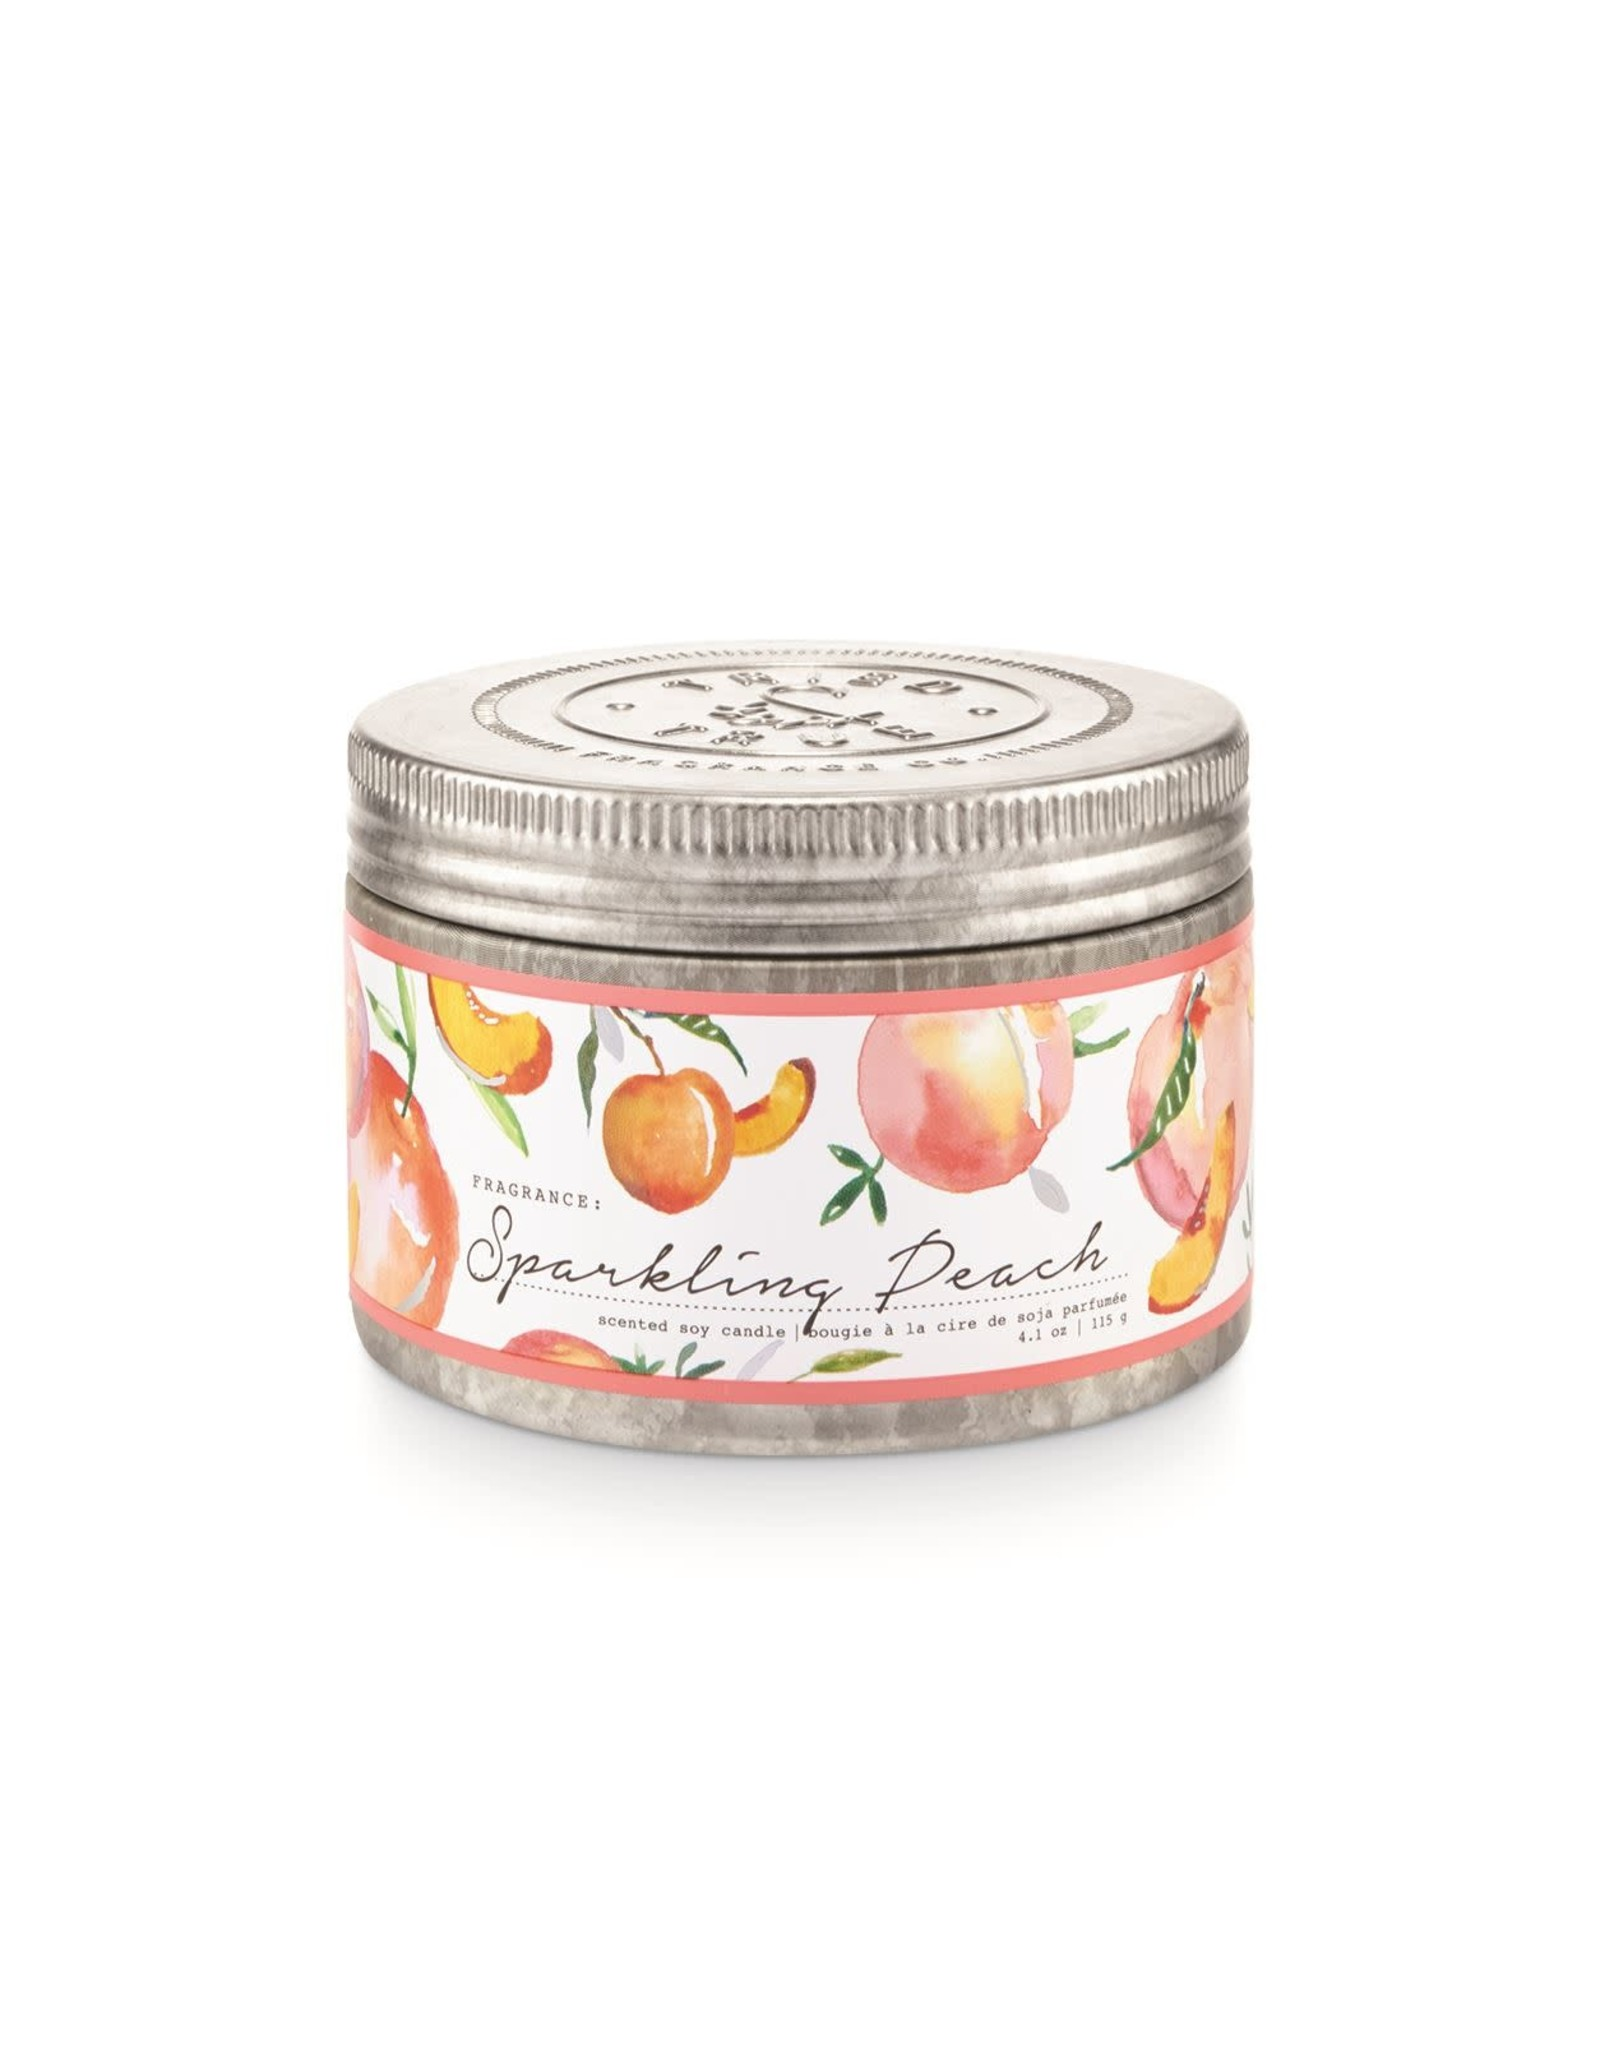 Tried & True 4.1 oz Tin Candle - Sparkling Peach